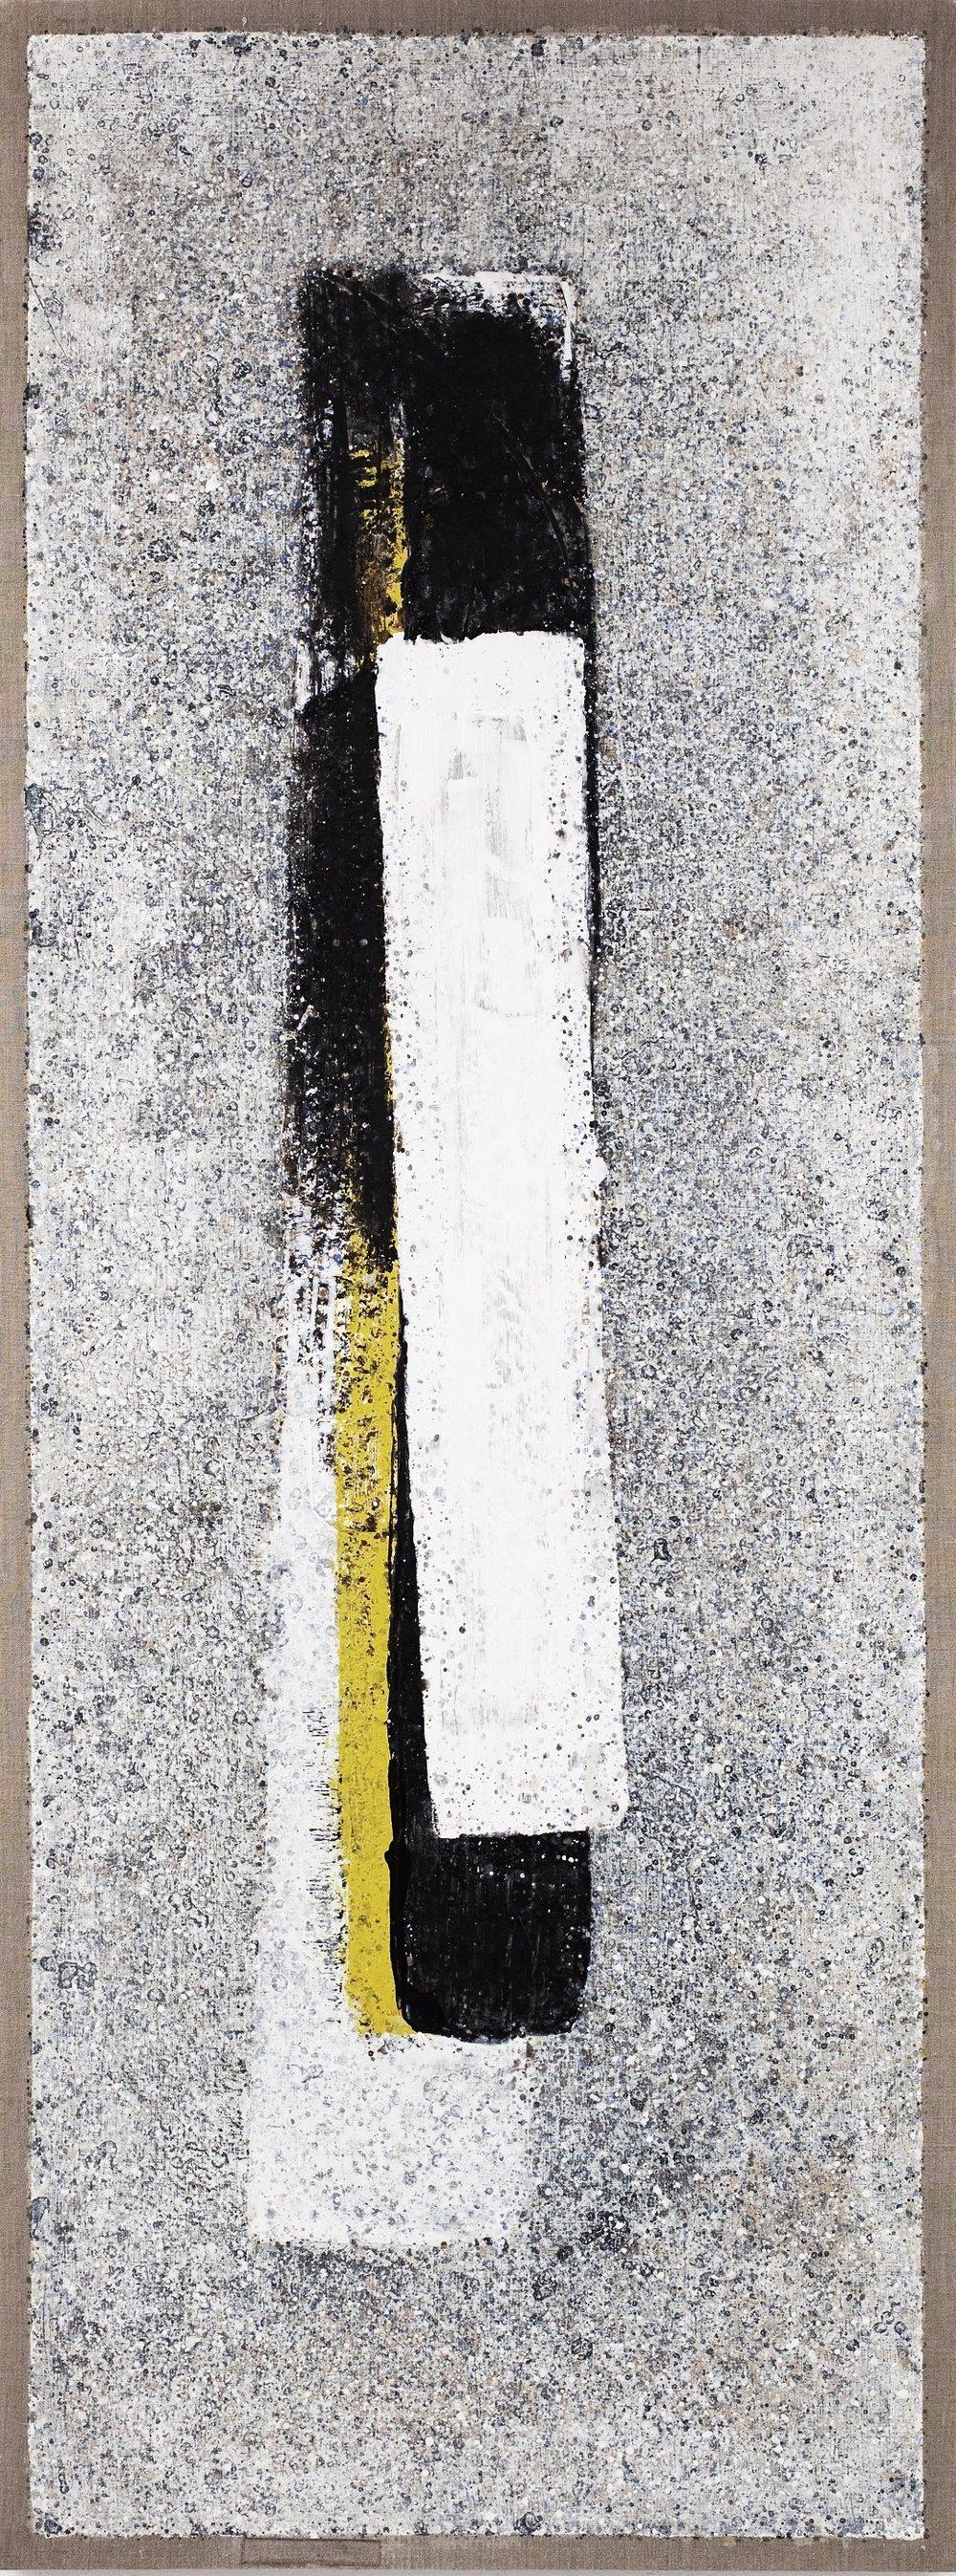 """Milarepa"" 80 x 30 inches, 2010"